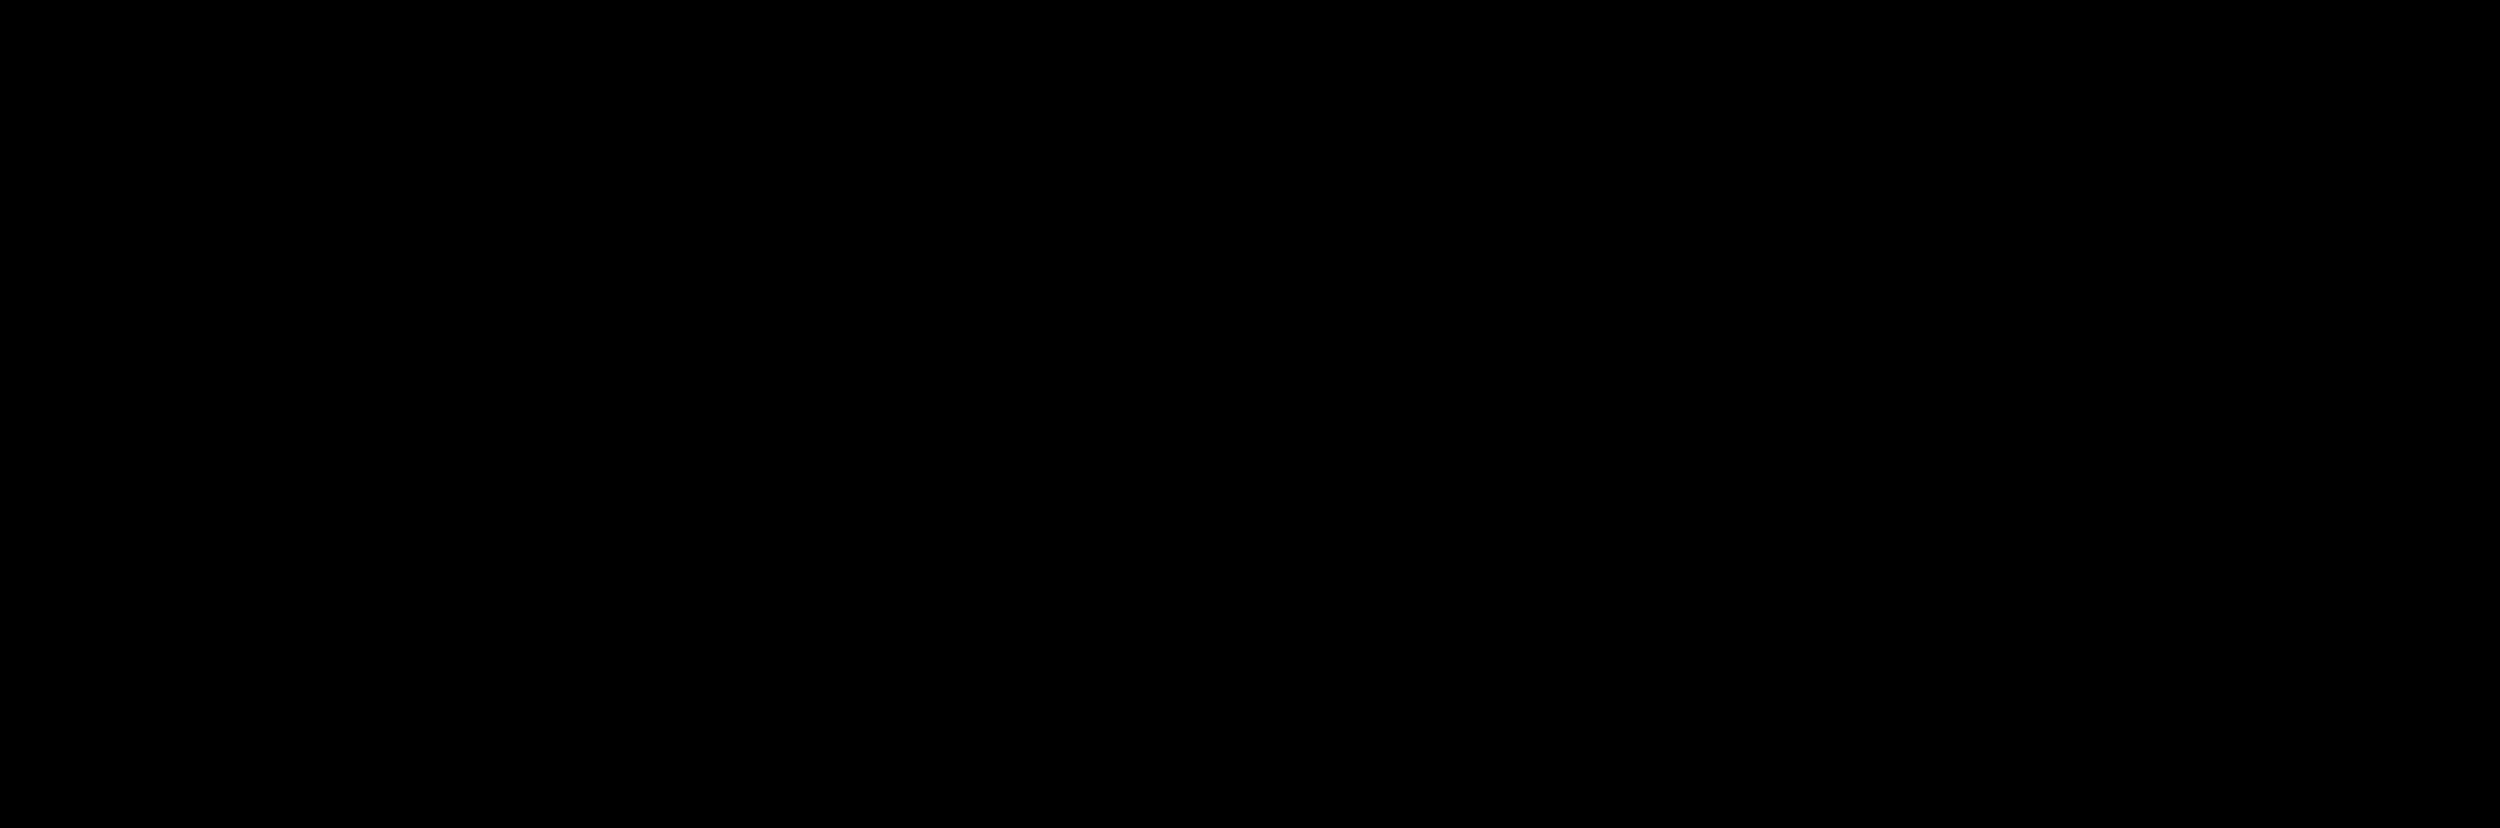 Costa_Signature_black.png